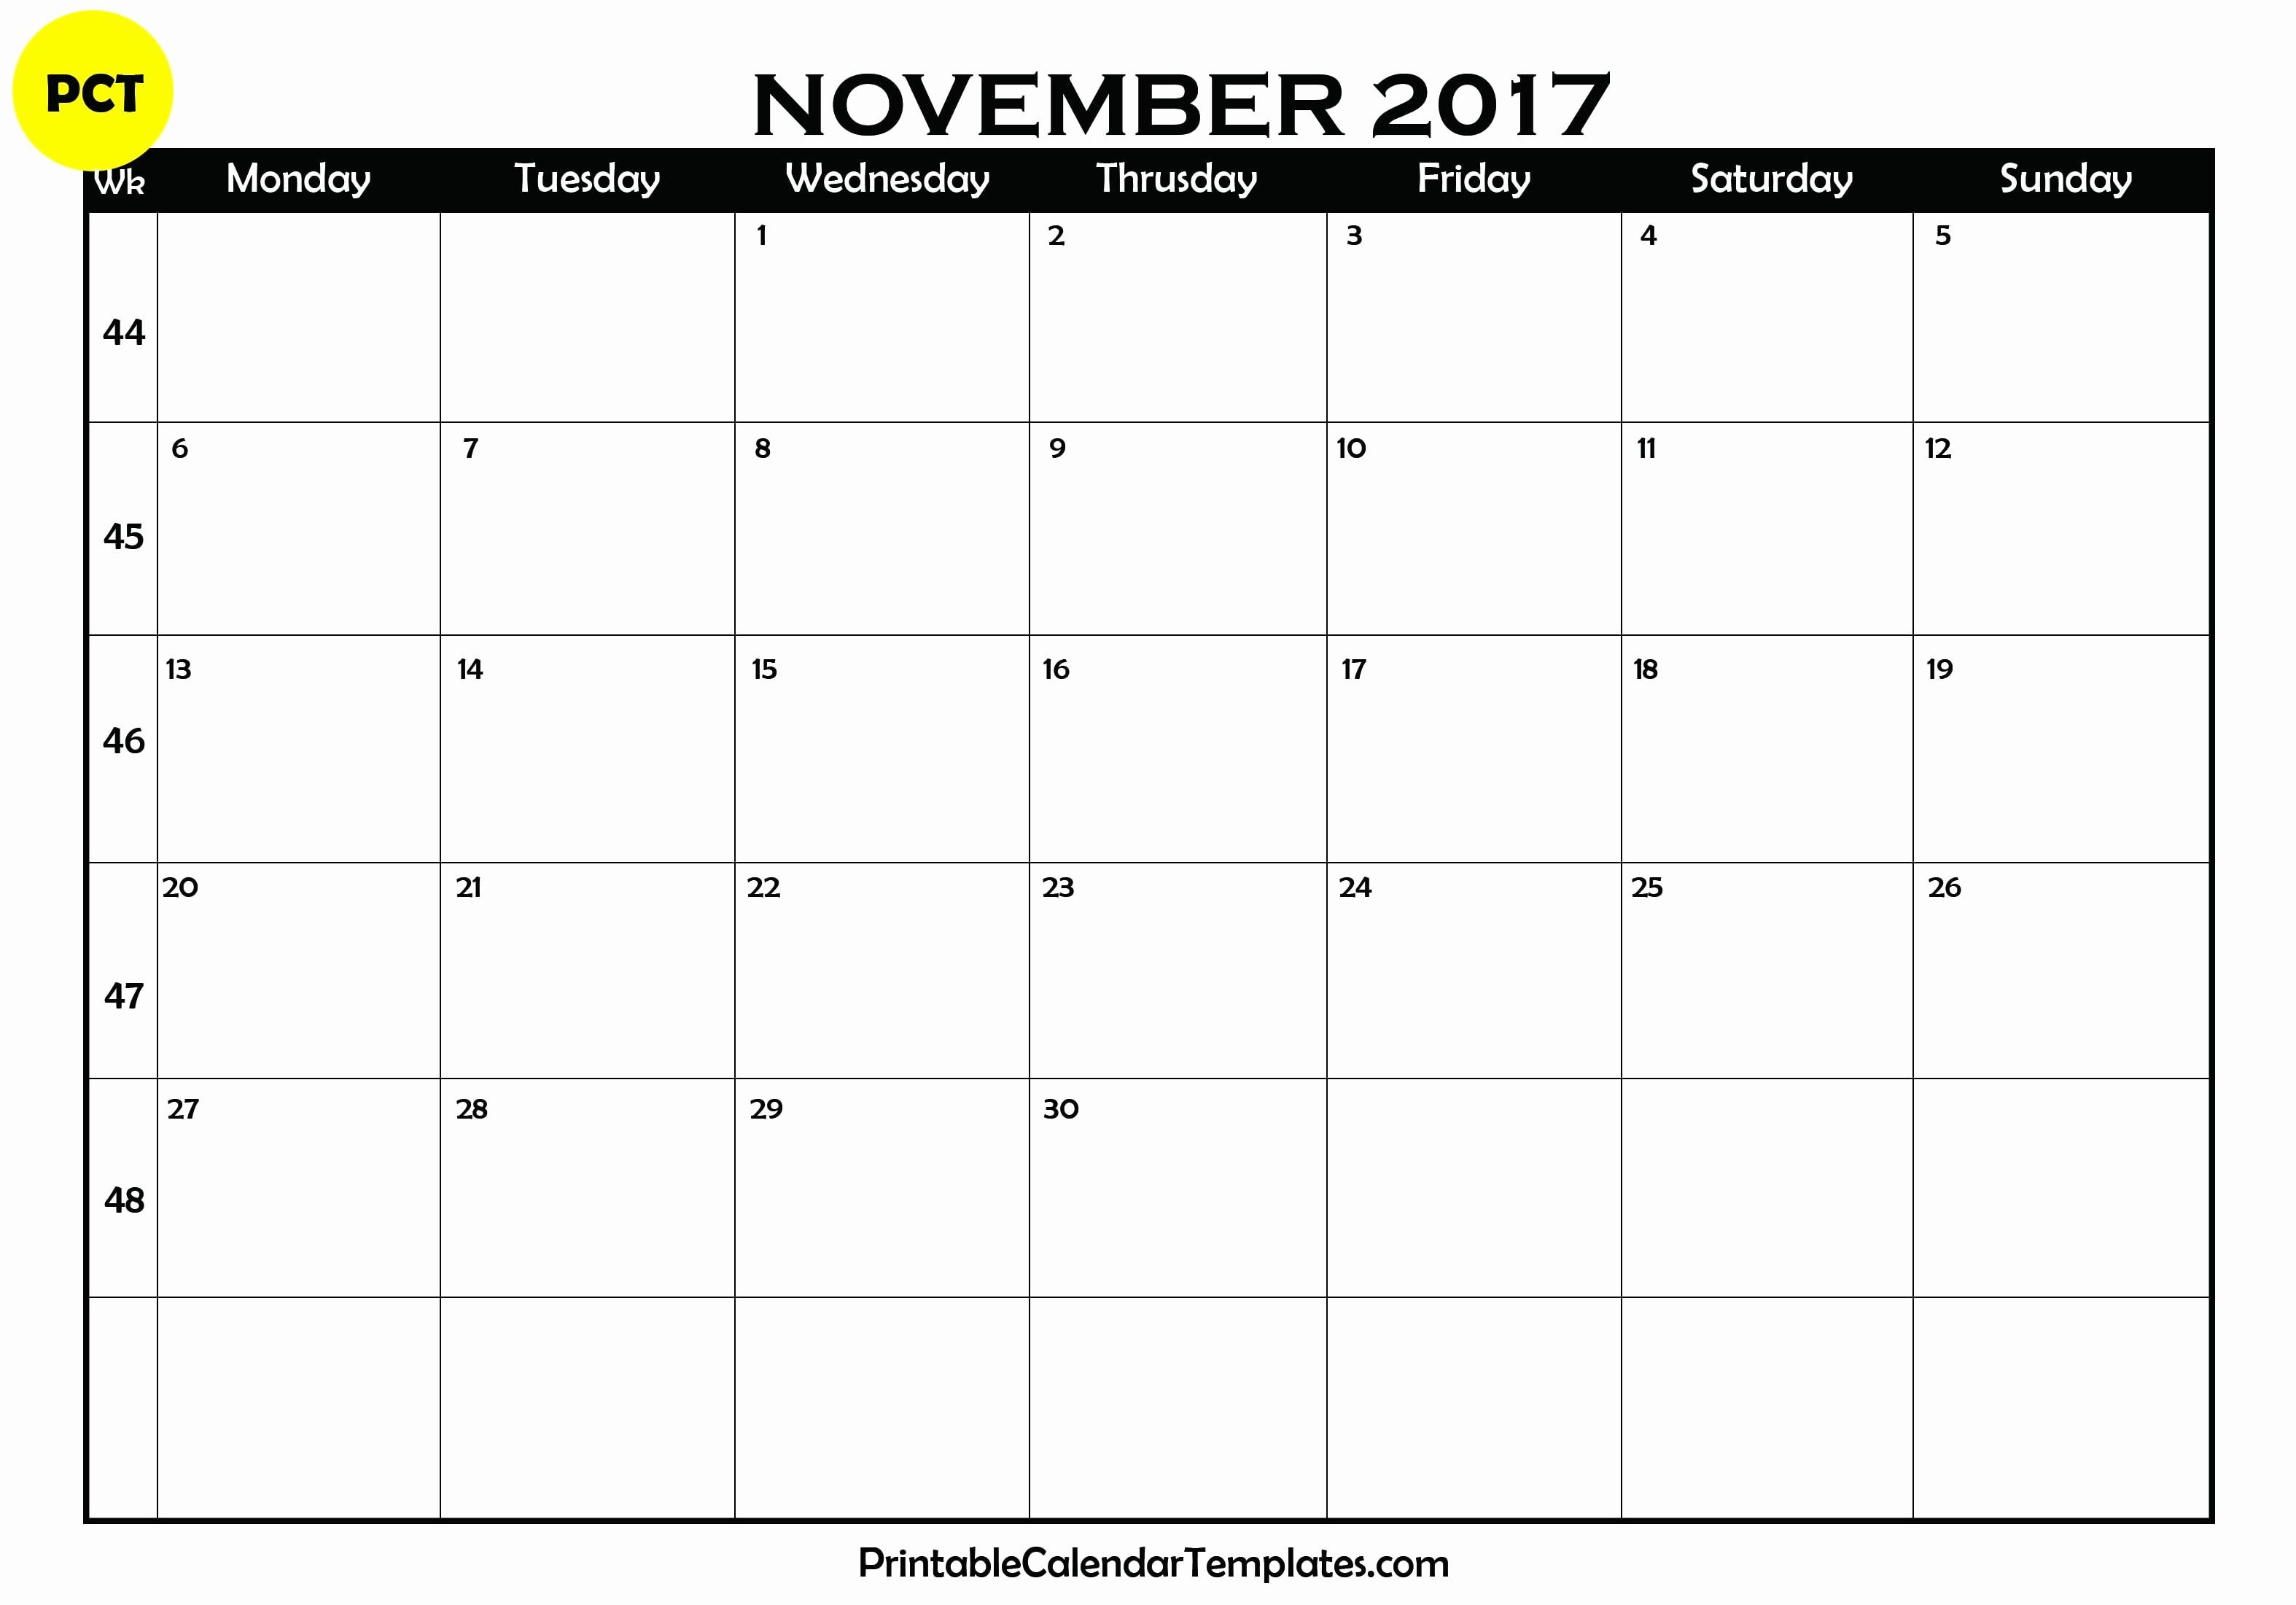 Blank November 2017 Calendar Template Awesome November 2017 Calendar Printable